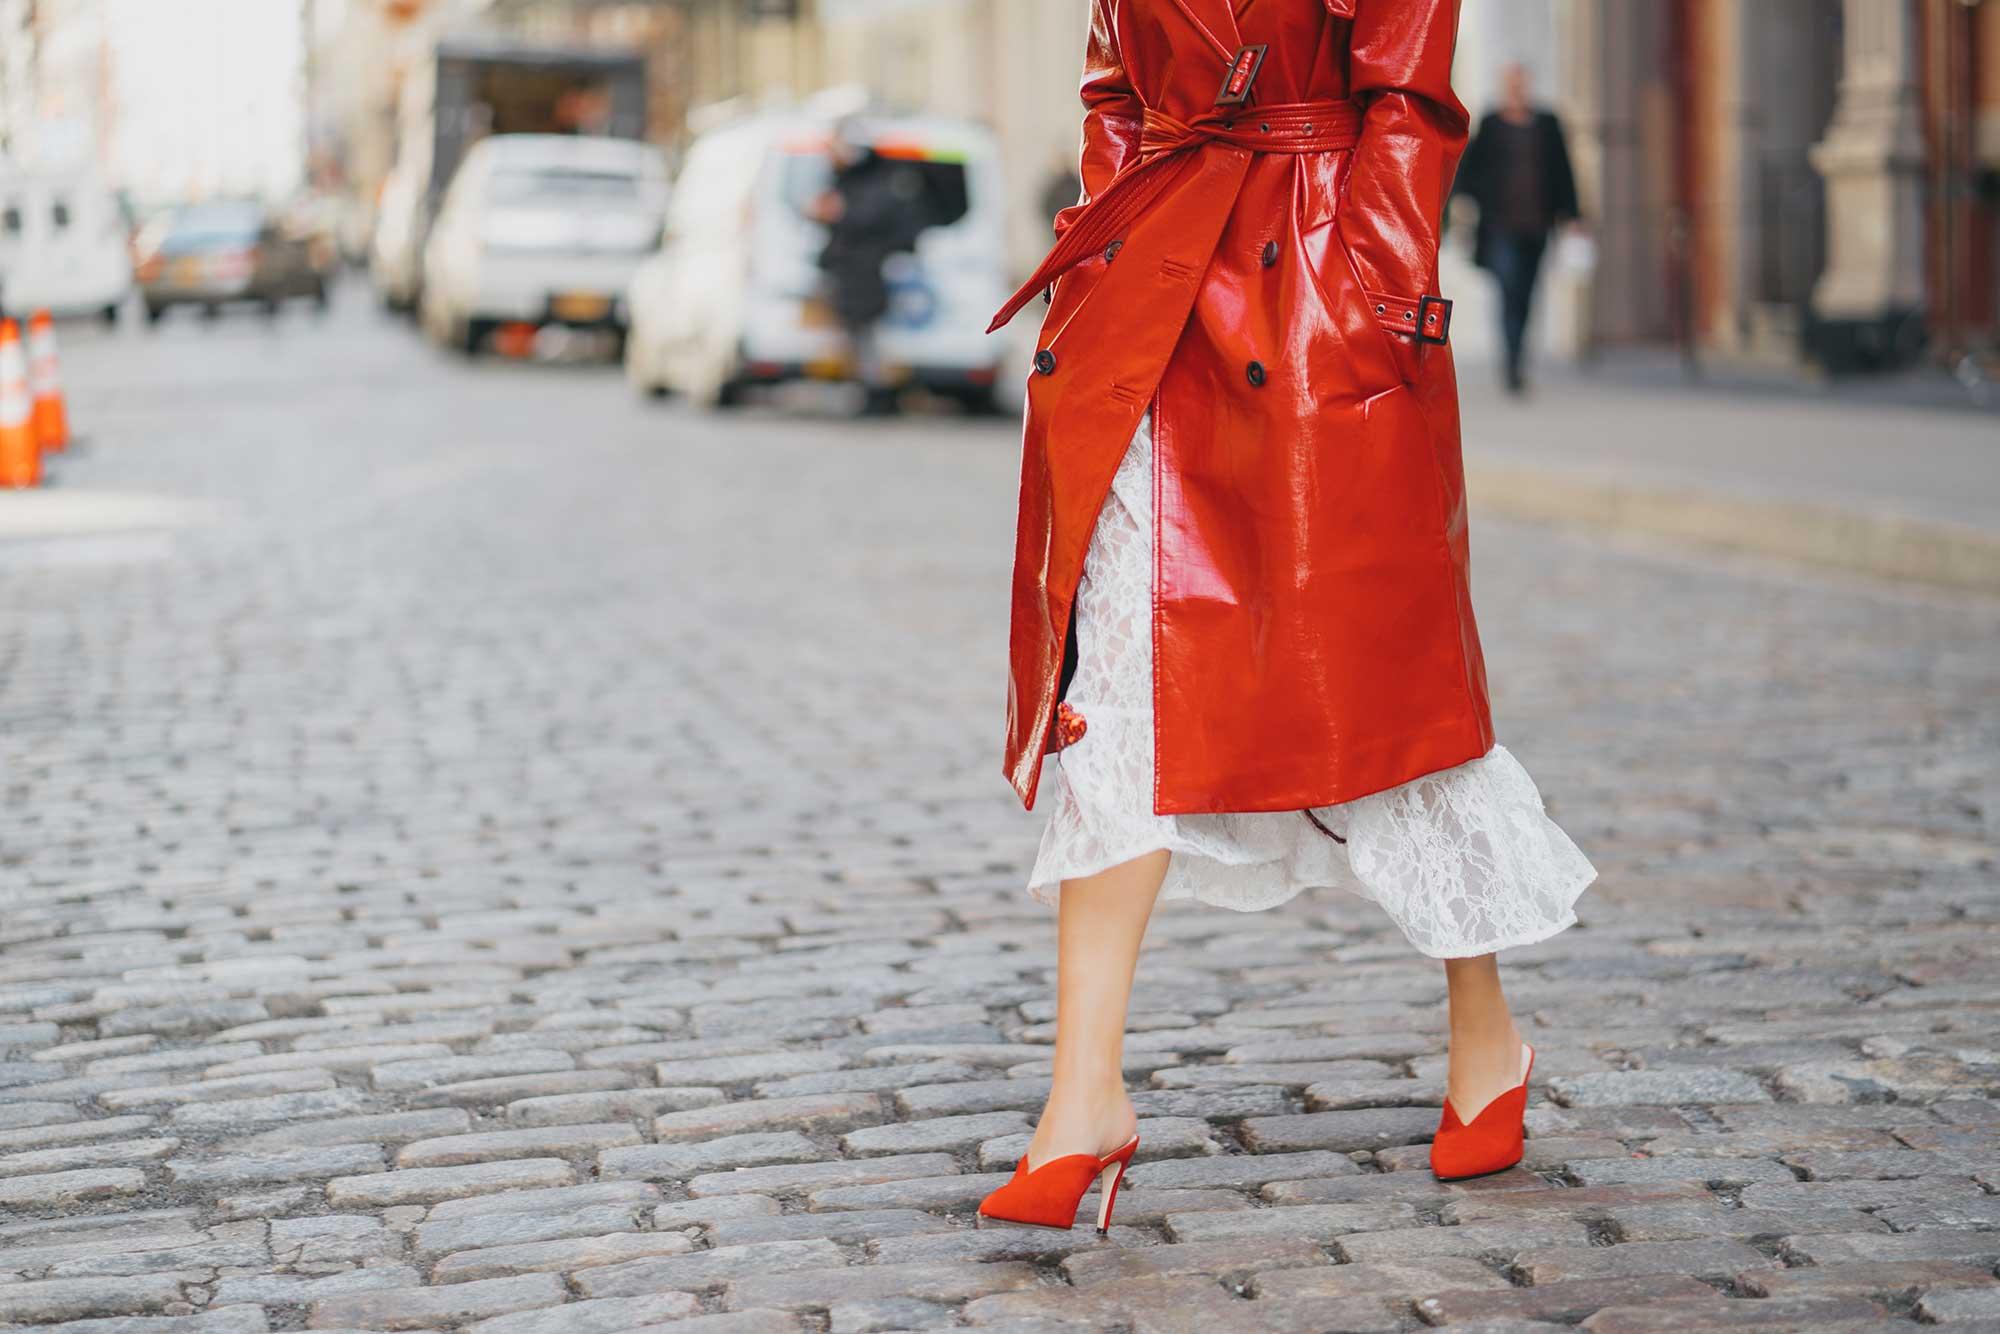 For-Love-and-Lemons-La-Zosia-Midi-Dress-Sheer-lace-sequin-heart-applique2.jpg